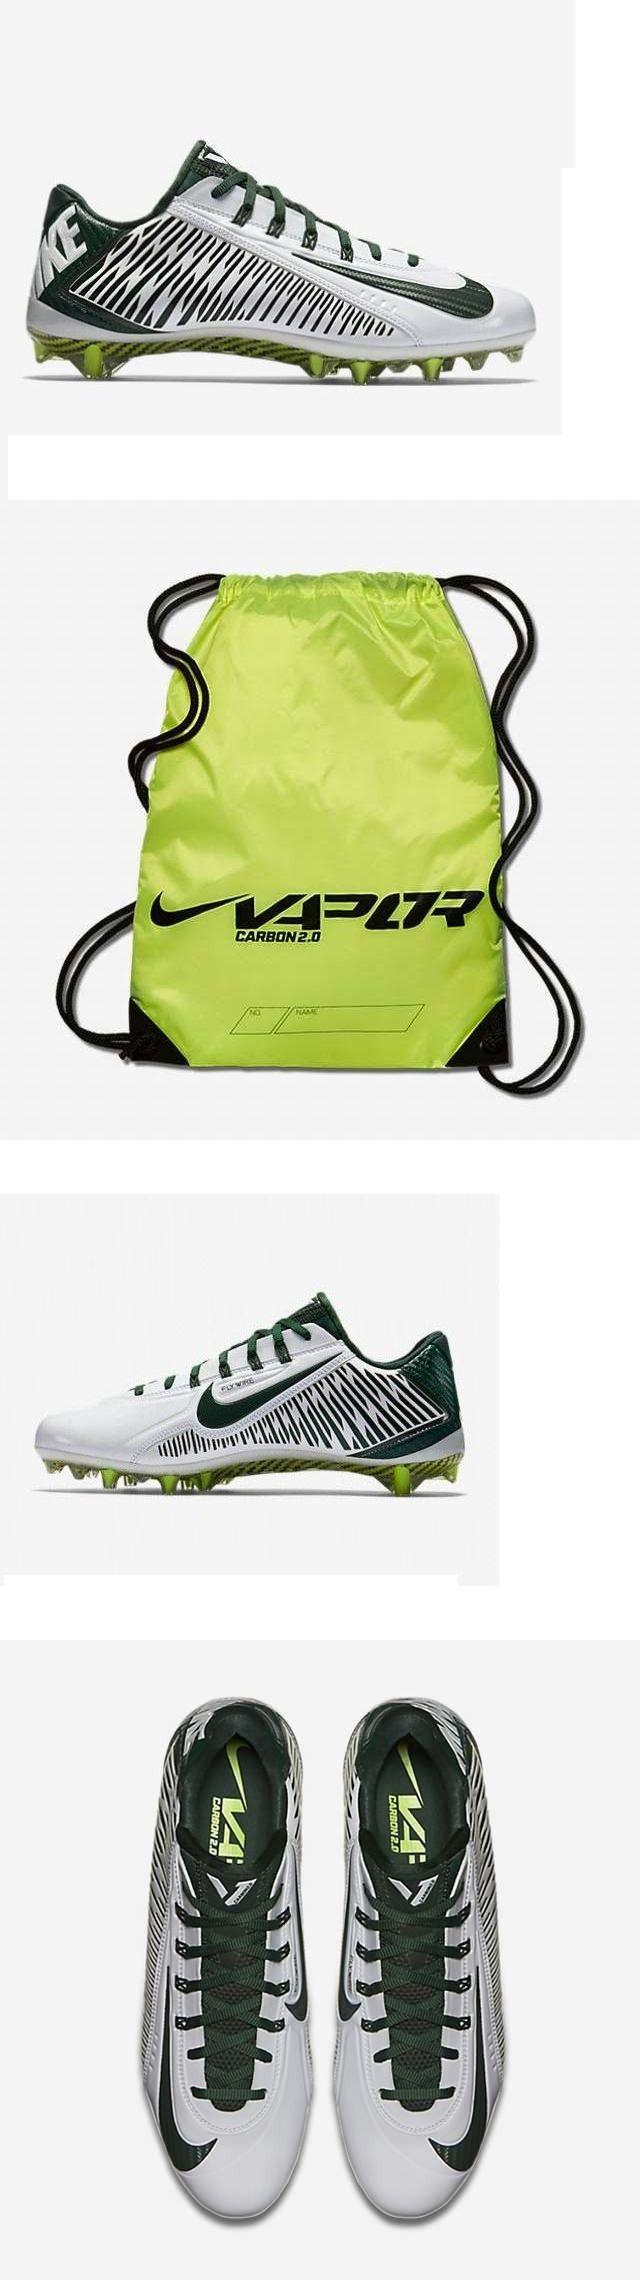 Men 159116: Men S Nike Vapor Carbon Elite Td Low Football Lacrosse Cleats W Bag Shoes 9 -> BUY IT NOW ONLY: $62.95 on eBay!